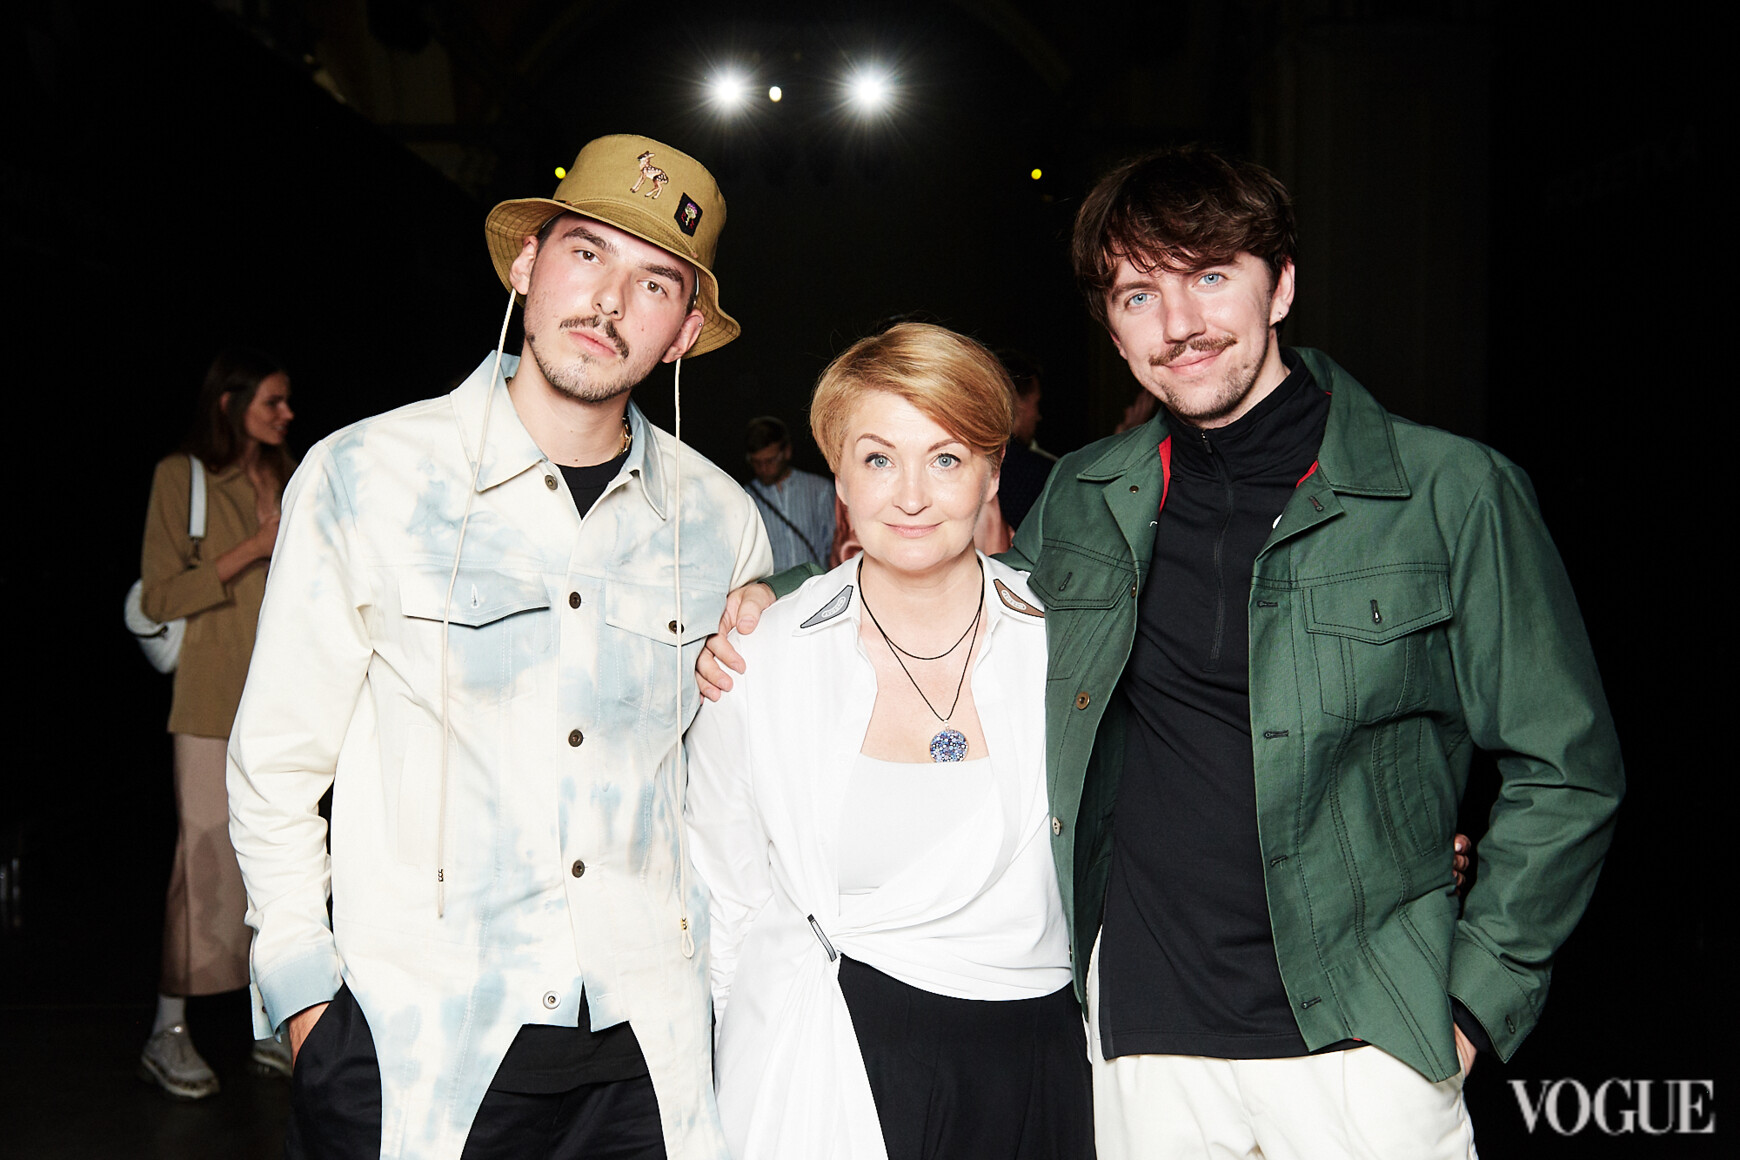 Петр Ясинский, Ирина Данилевская, Руслан Багинский